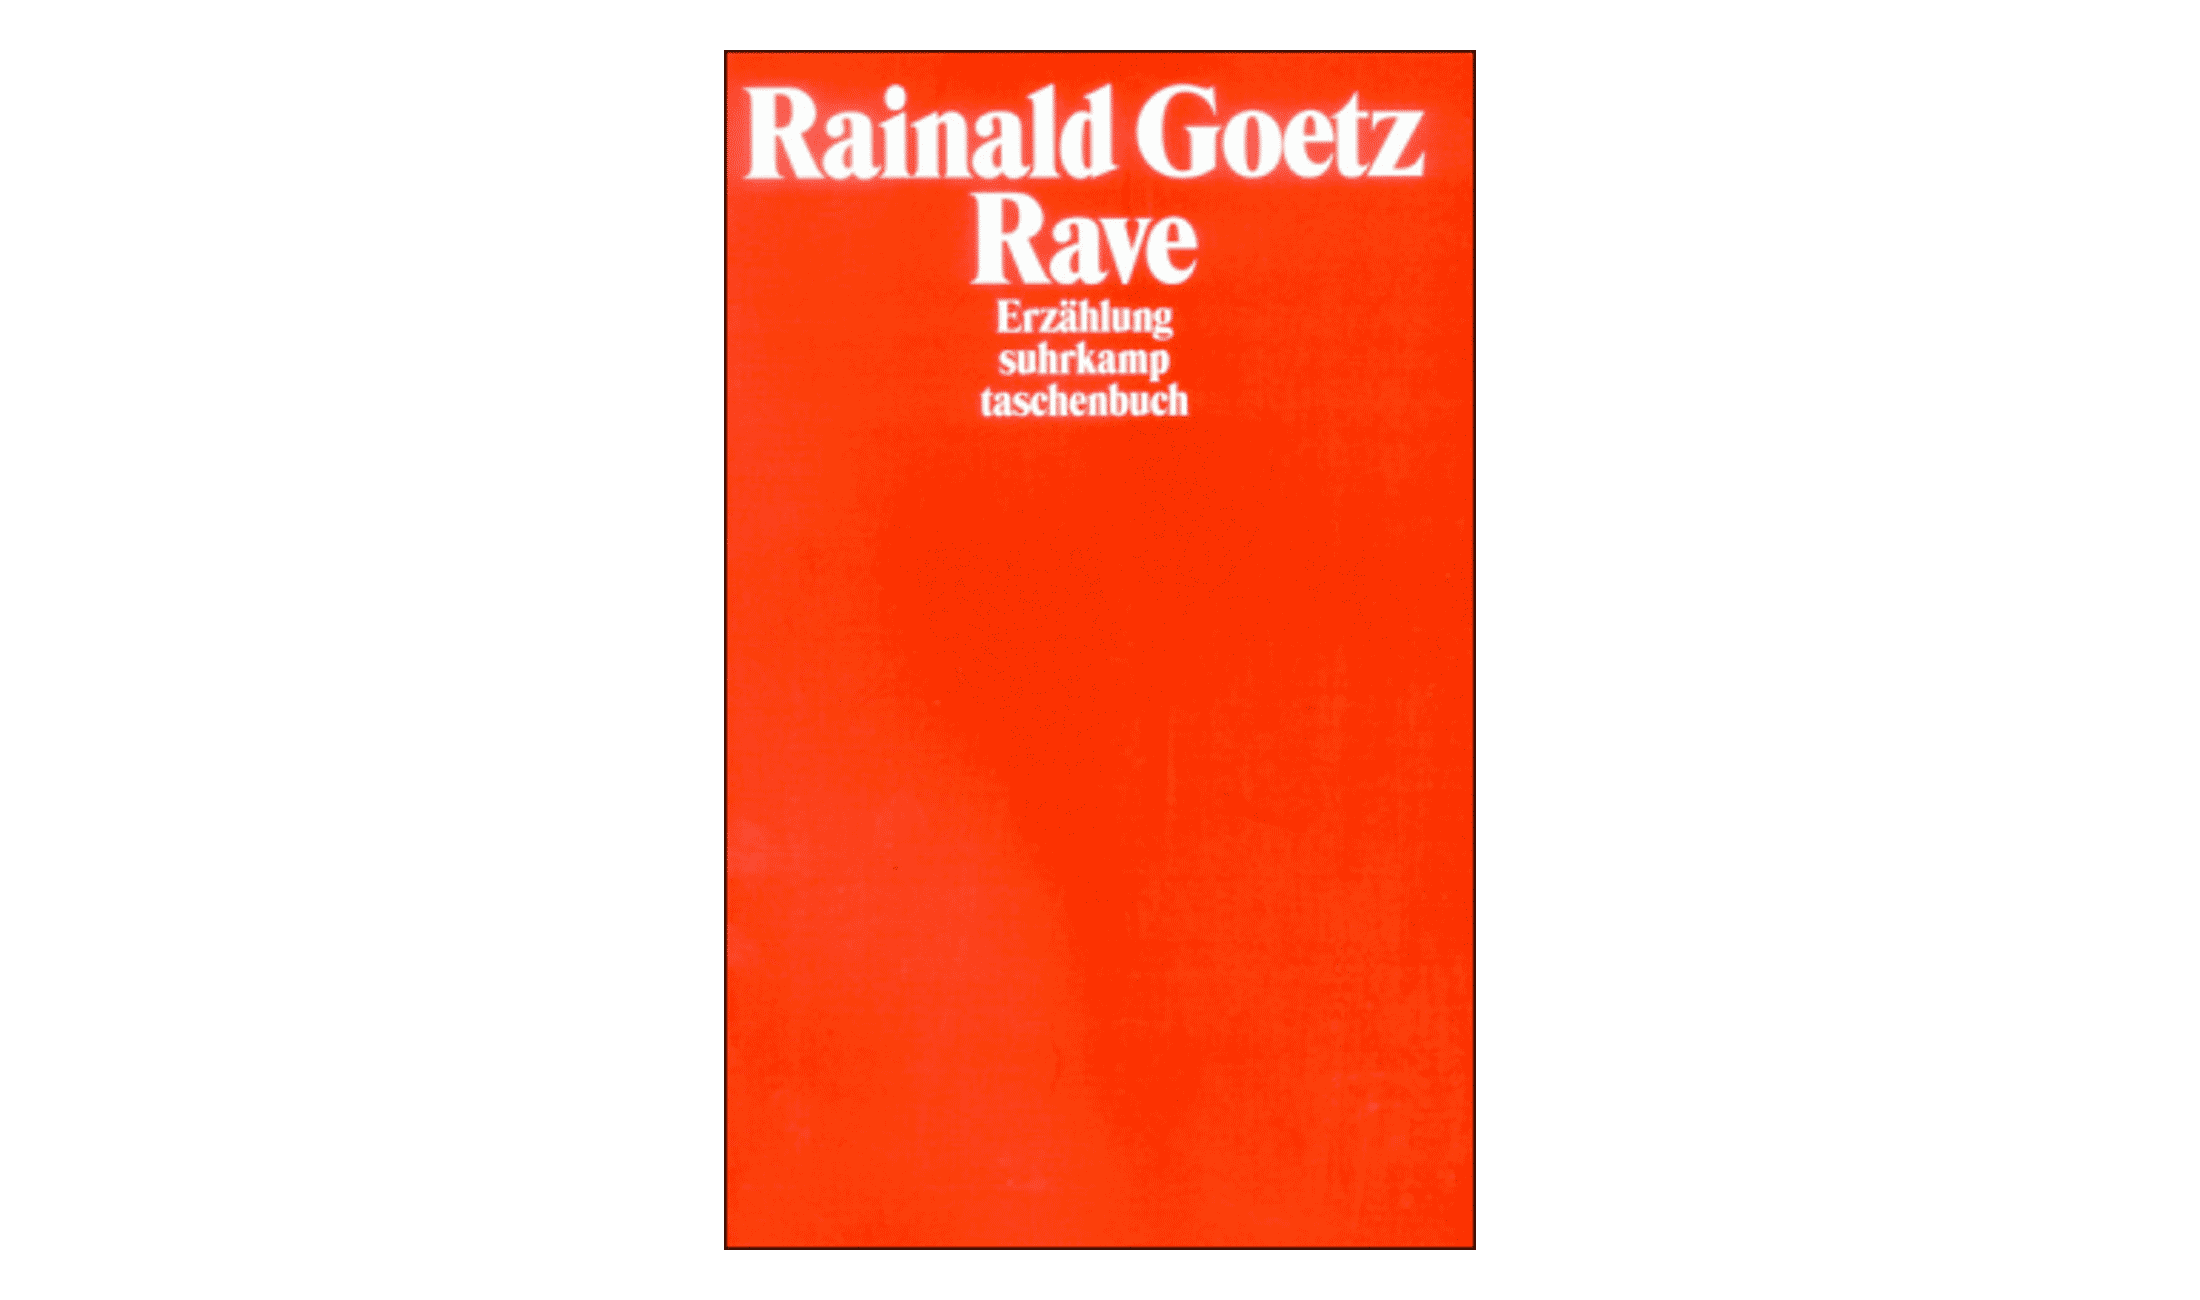 Rainald Goetz Rave.